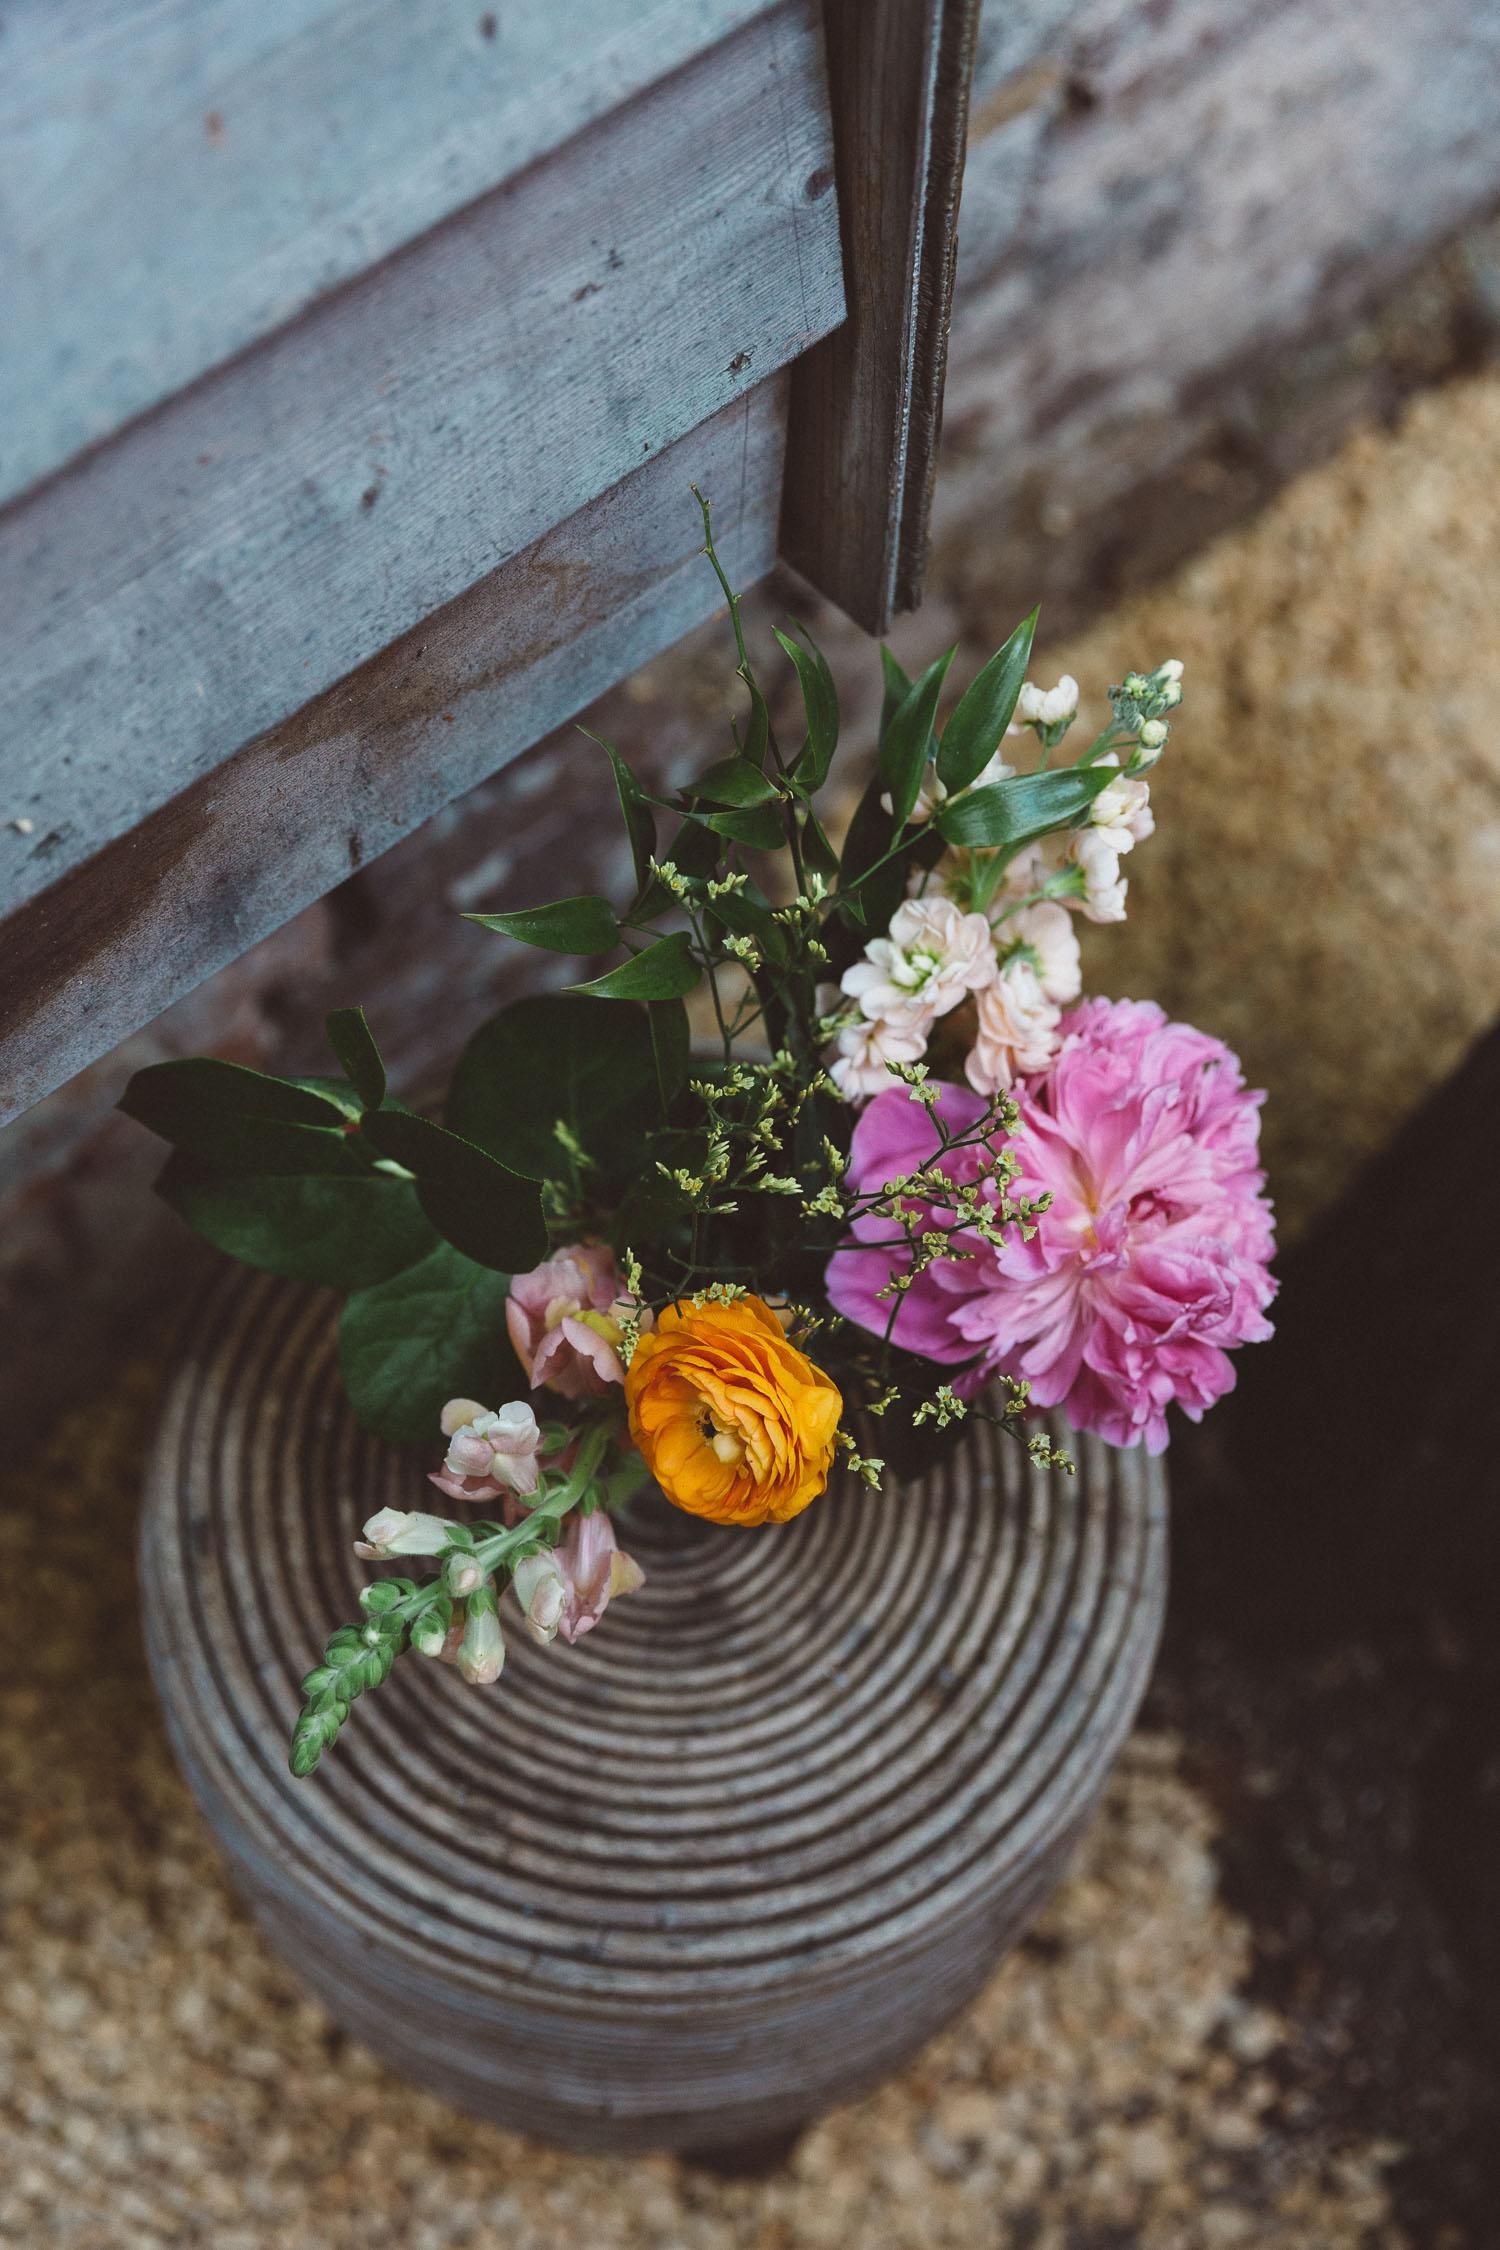 Backyard-wedding-Bruiloft-Annemiek-David-fotografie-photography-On-a-hazy-morning-Amsterdam-The-Netherlands262.jpg